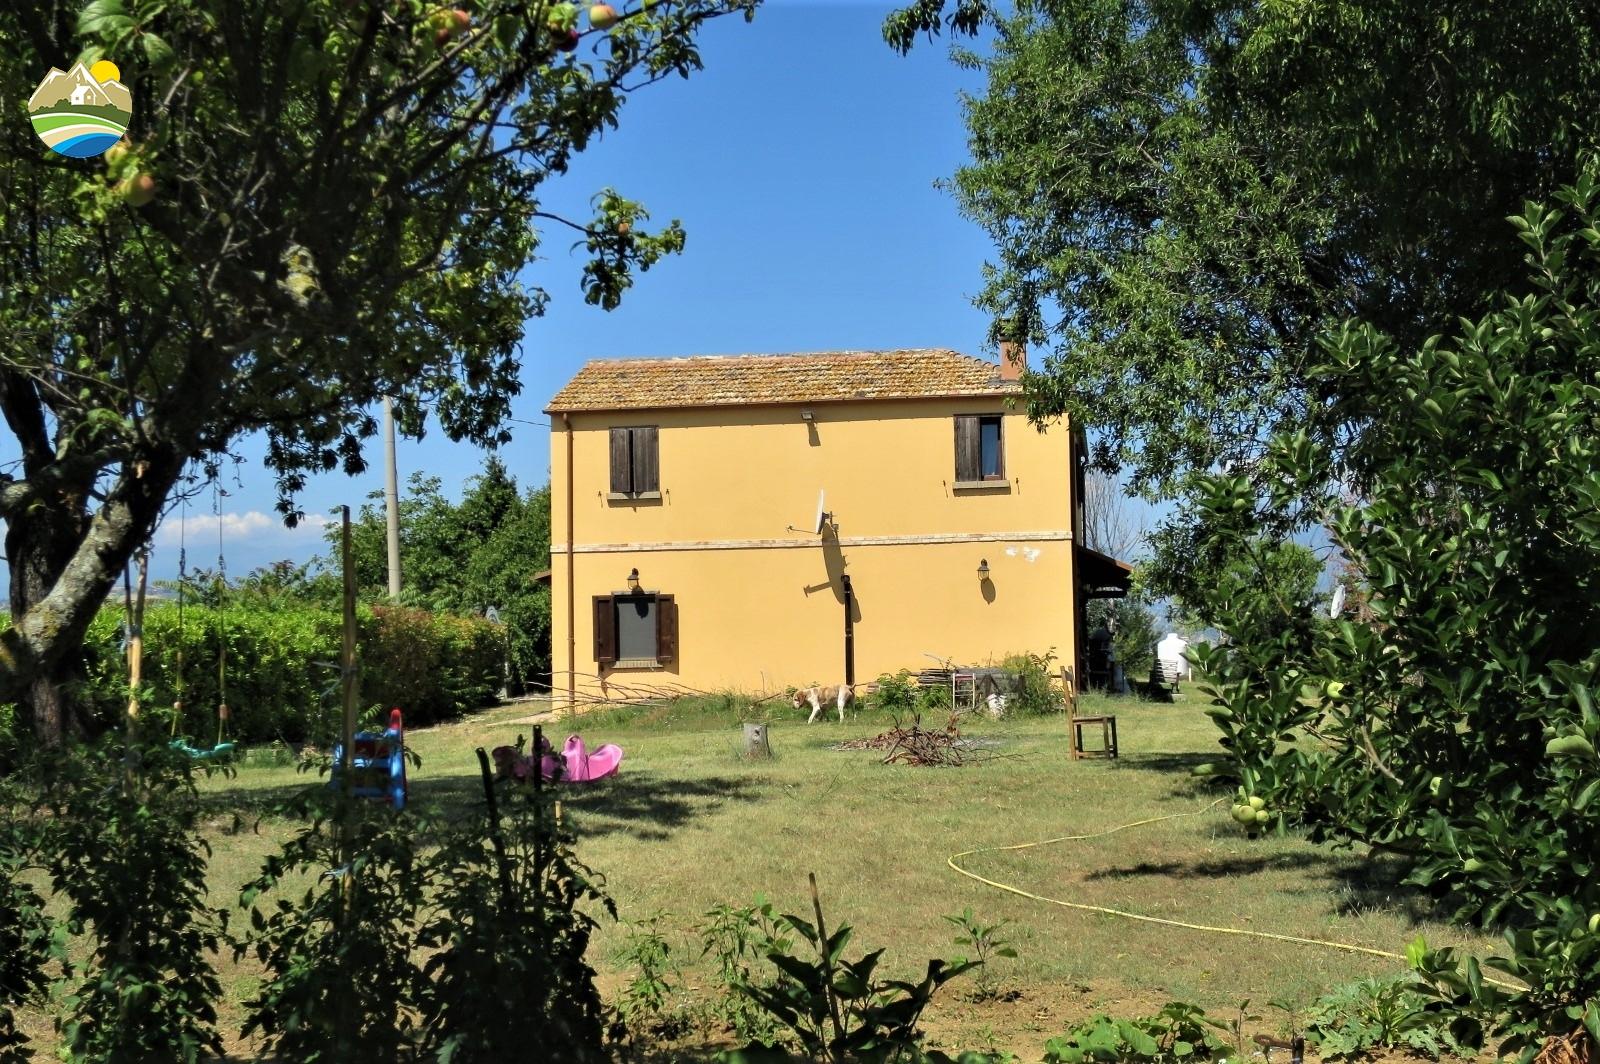 Country Houses Country Houses for sale Morro D'Oro (TE), Casa del Moro - Morro D'Oro - EUR 327.141 440